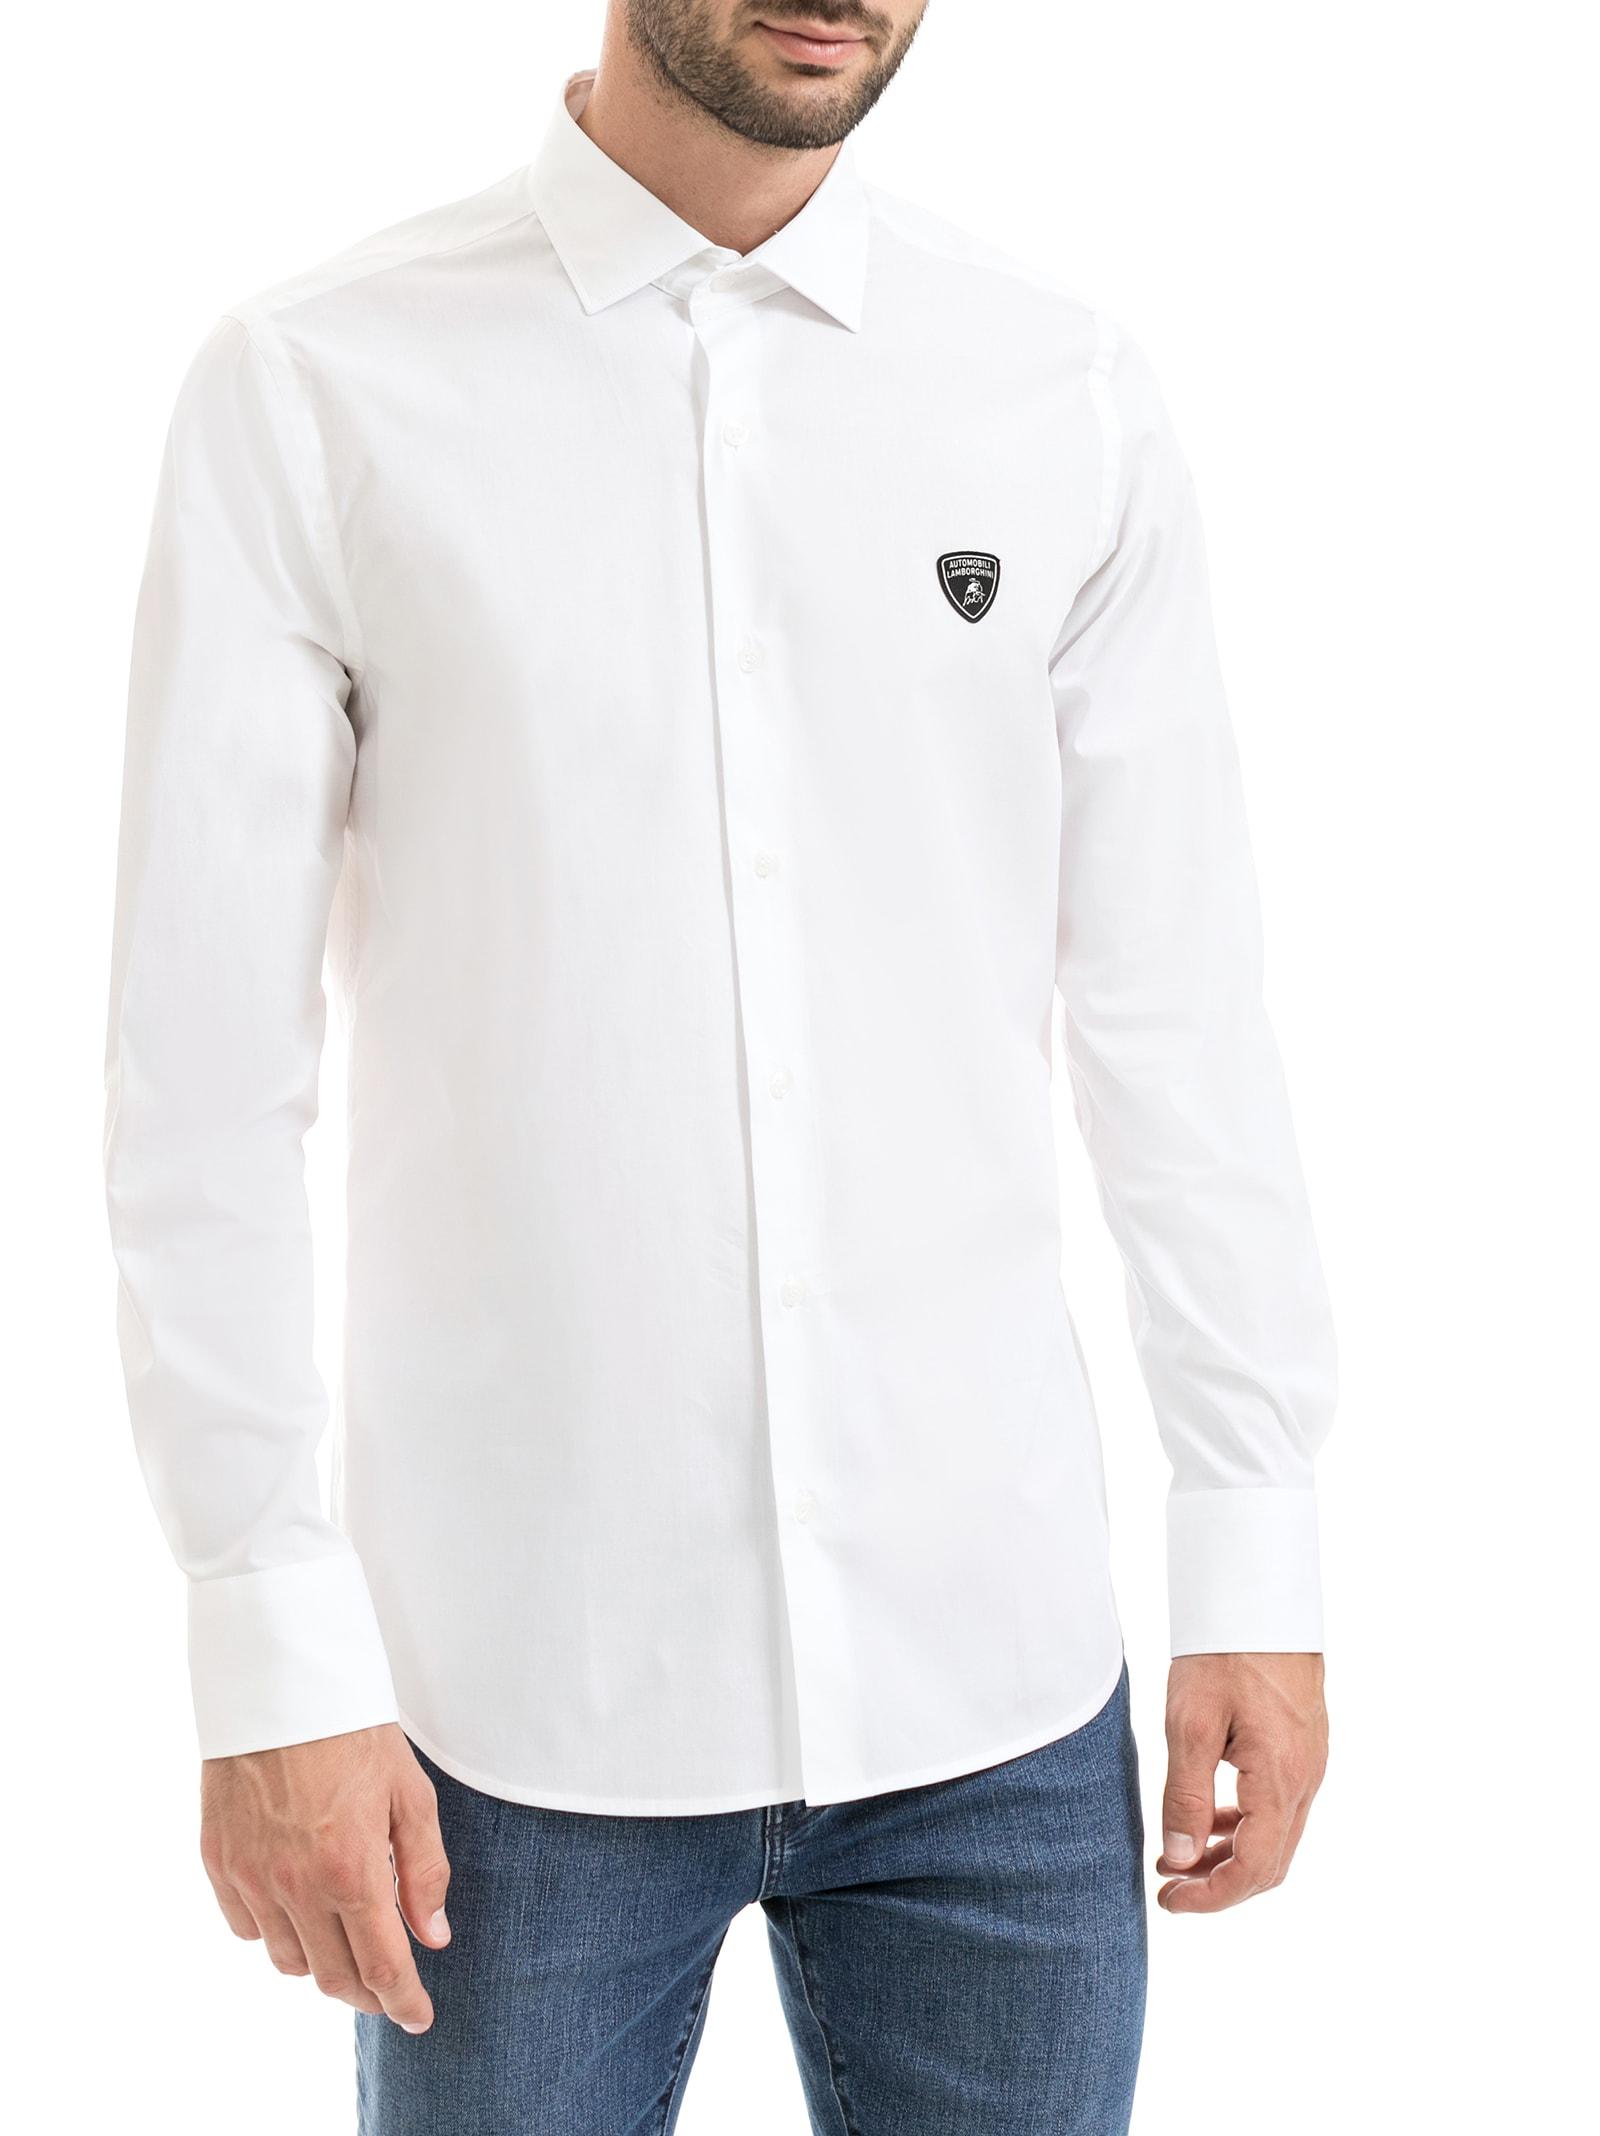 Essential Shirt In Stretch Poplin